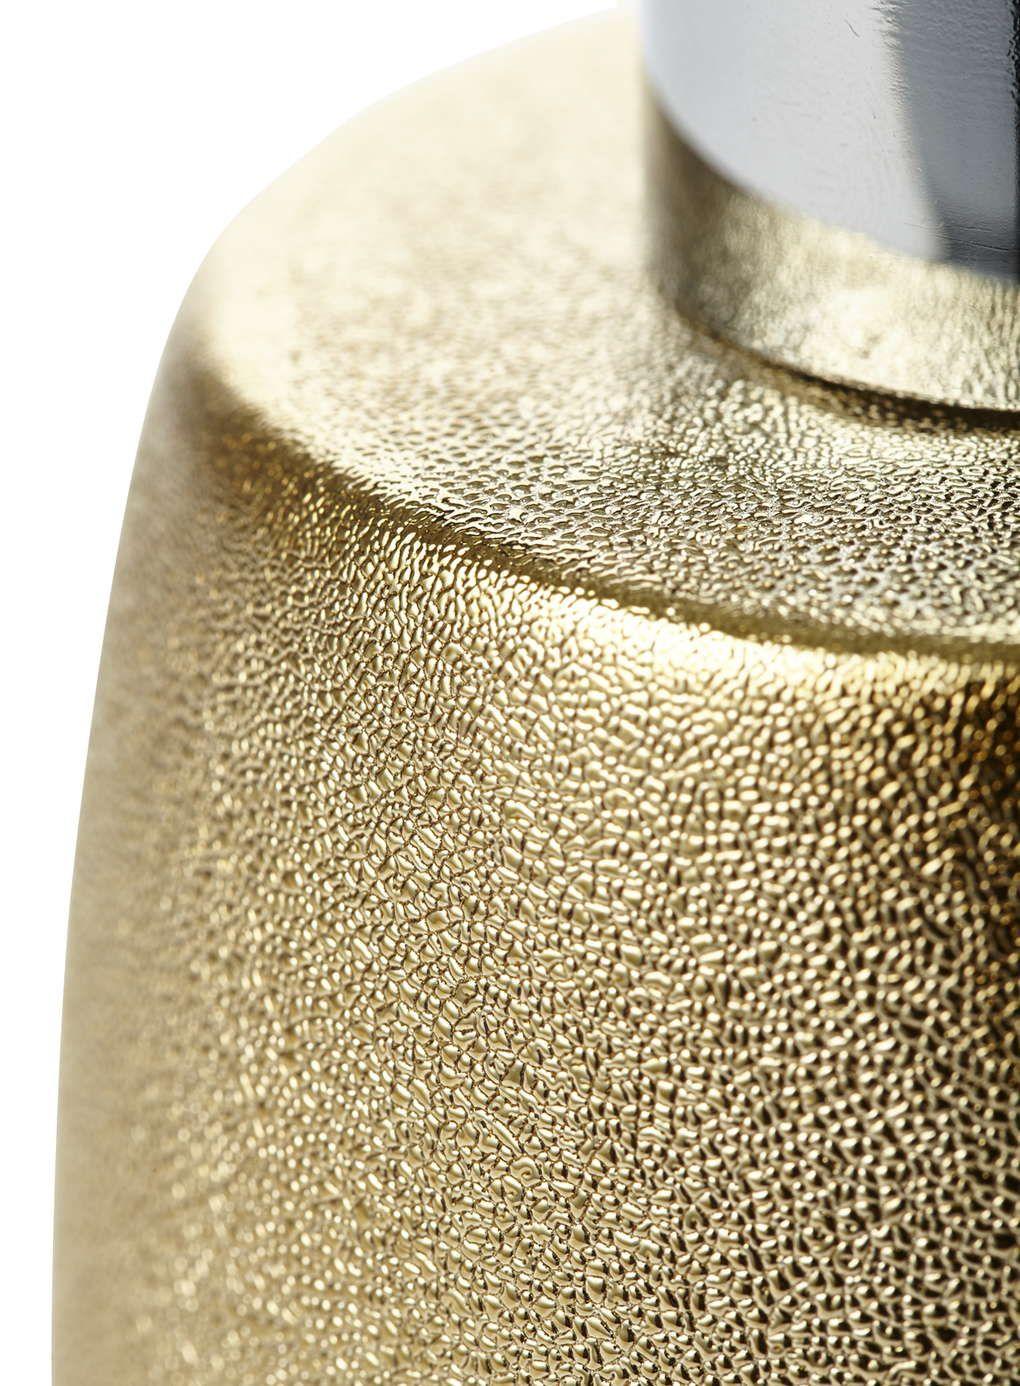 Bhs Bathroom Storage Gold Glam Textured Soap Dispenser Bhs Soap Dispancers